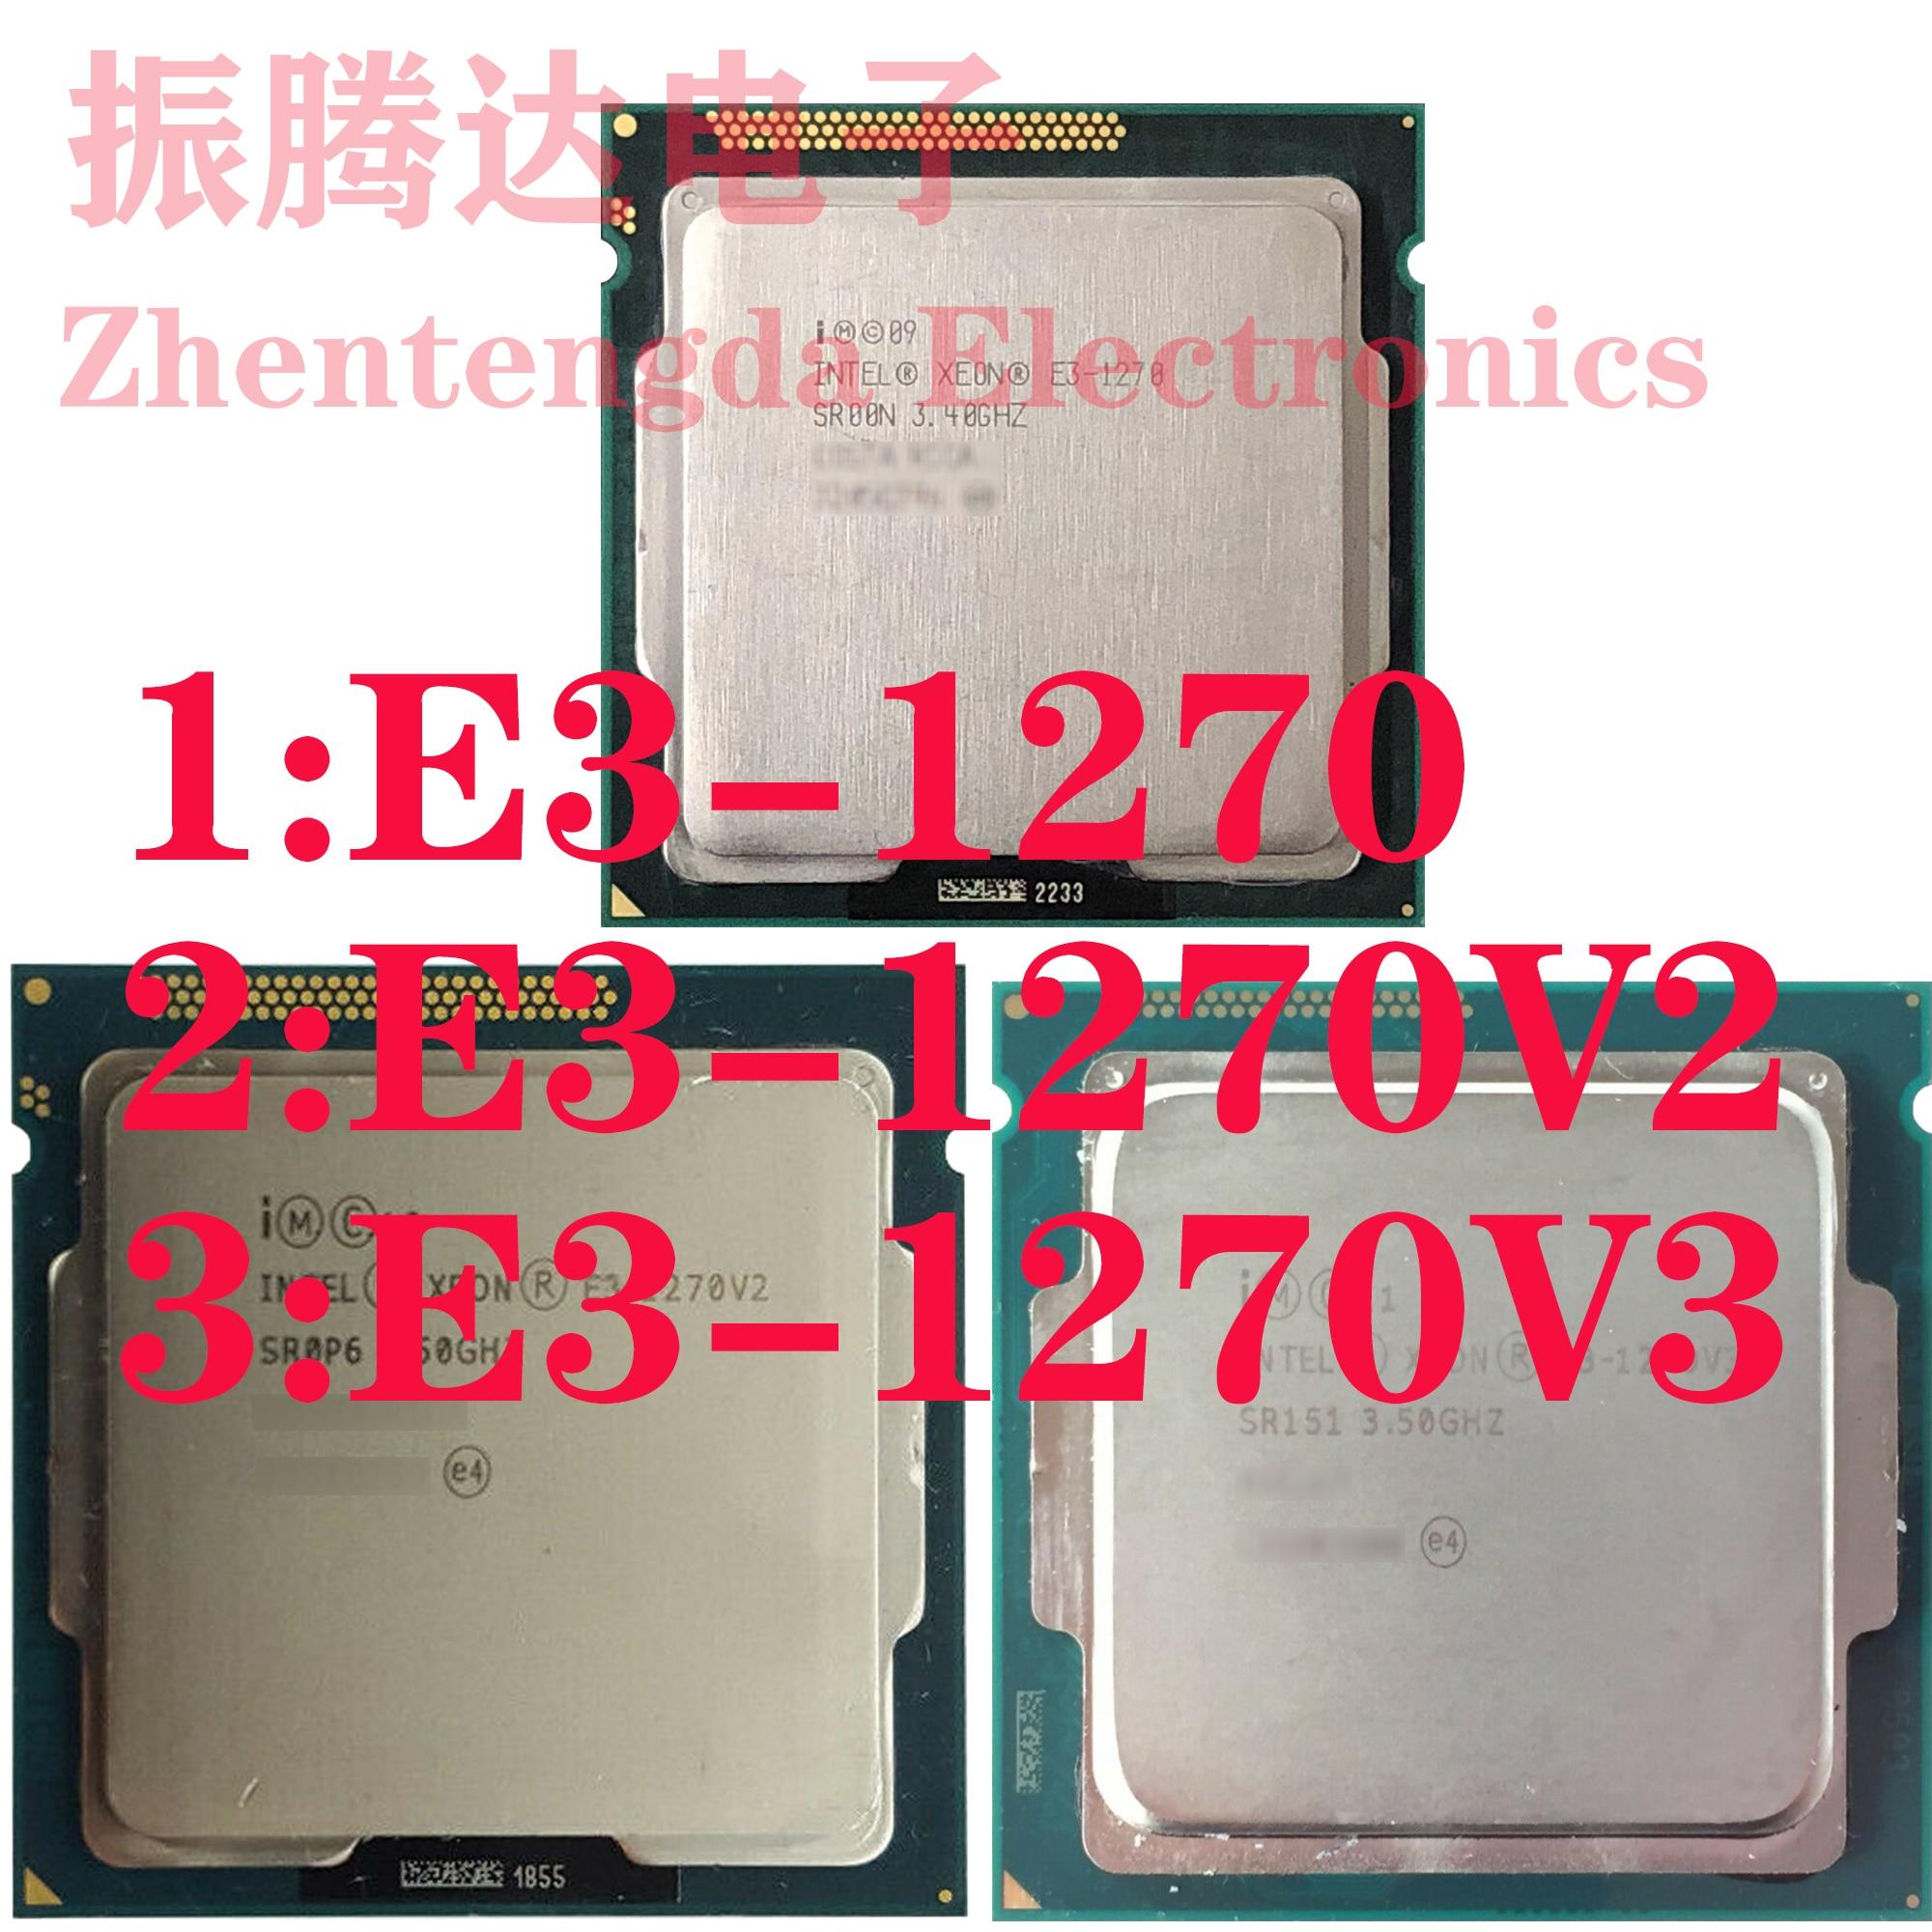 E3-1270 (3.4GHz 4 Core 8 Threads) E3-1270 v2 (3.5GHz 4 Core 8 Threads) E3-1270 v3 (3.5GHz 4 Core 8 Threads)